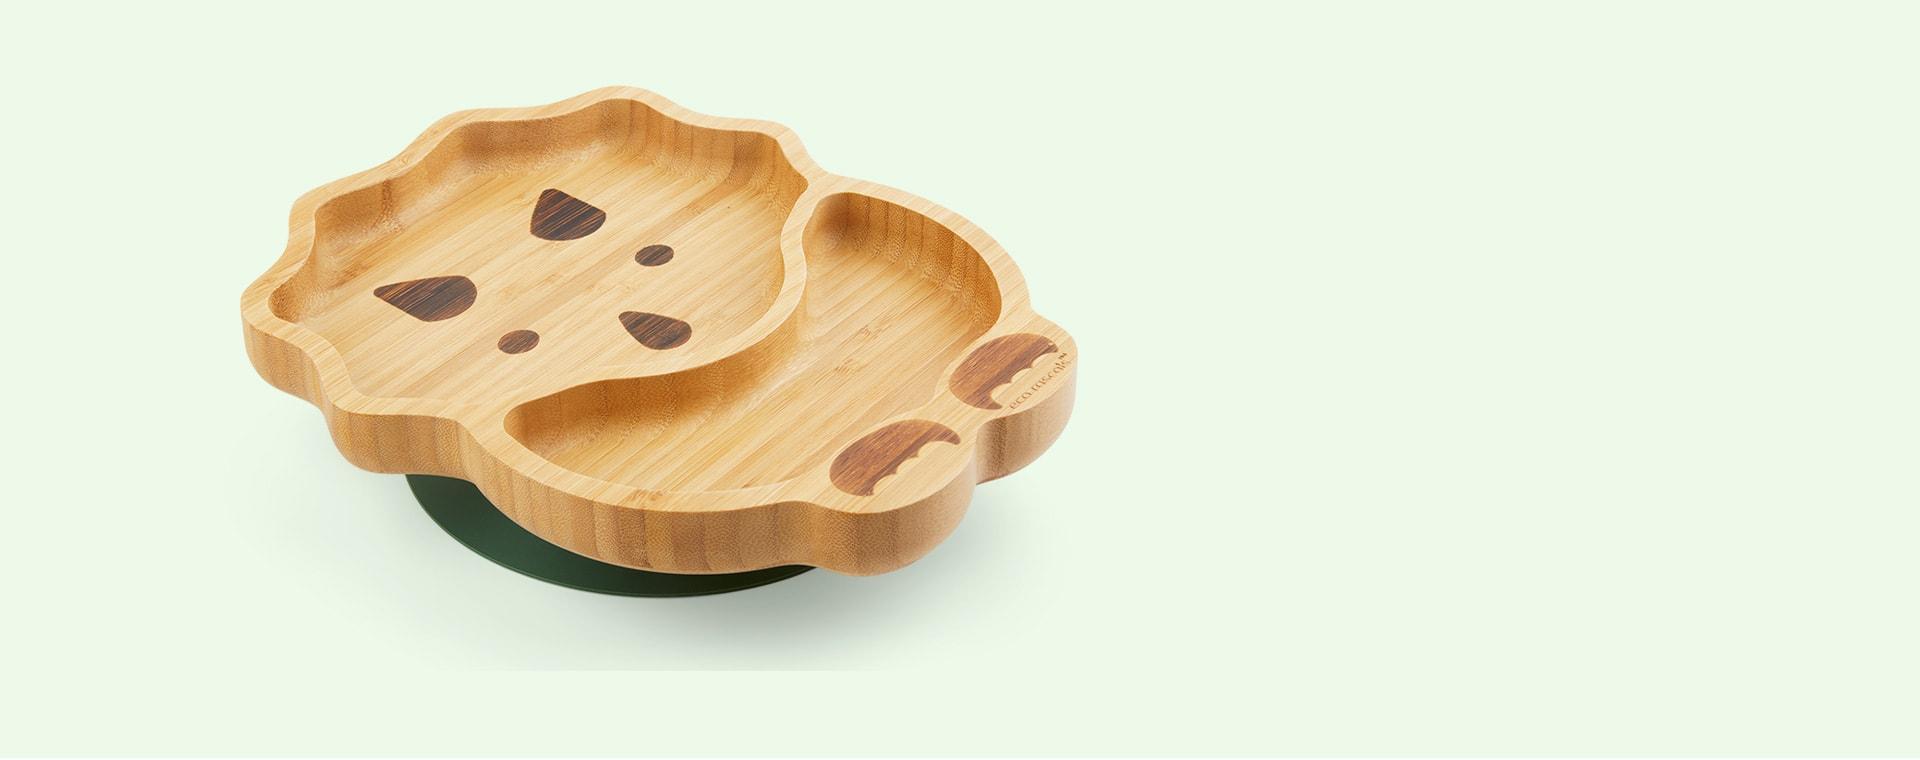 Green eco rascals Bamboo Suction Dinosaur Plate